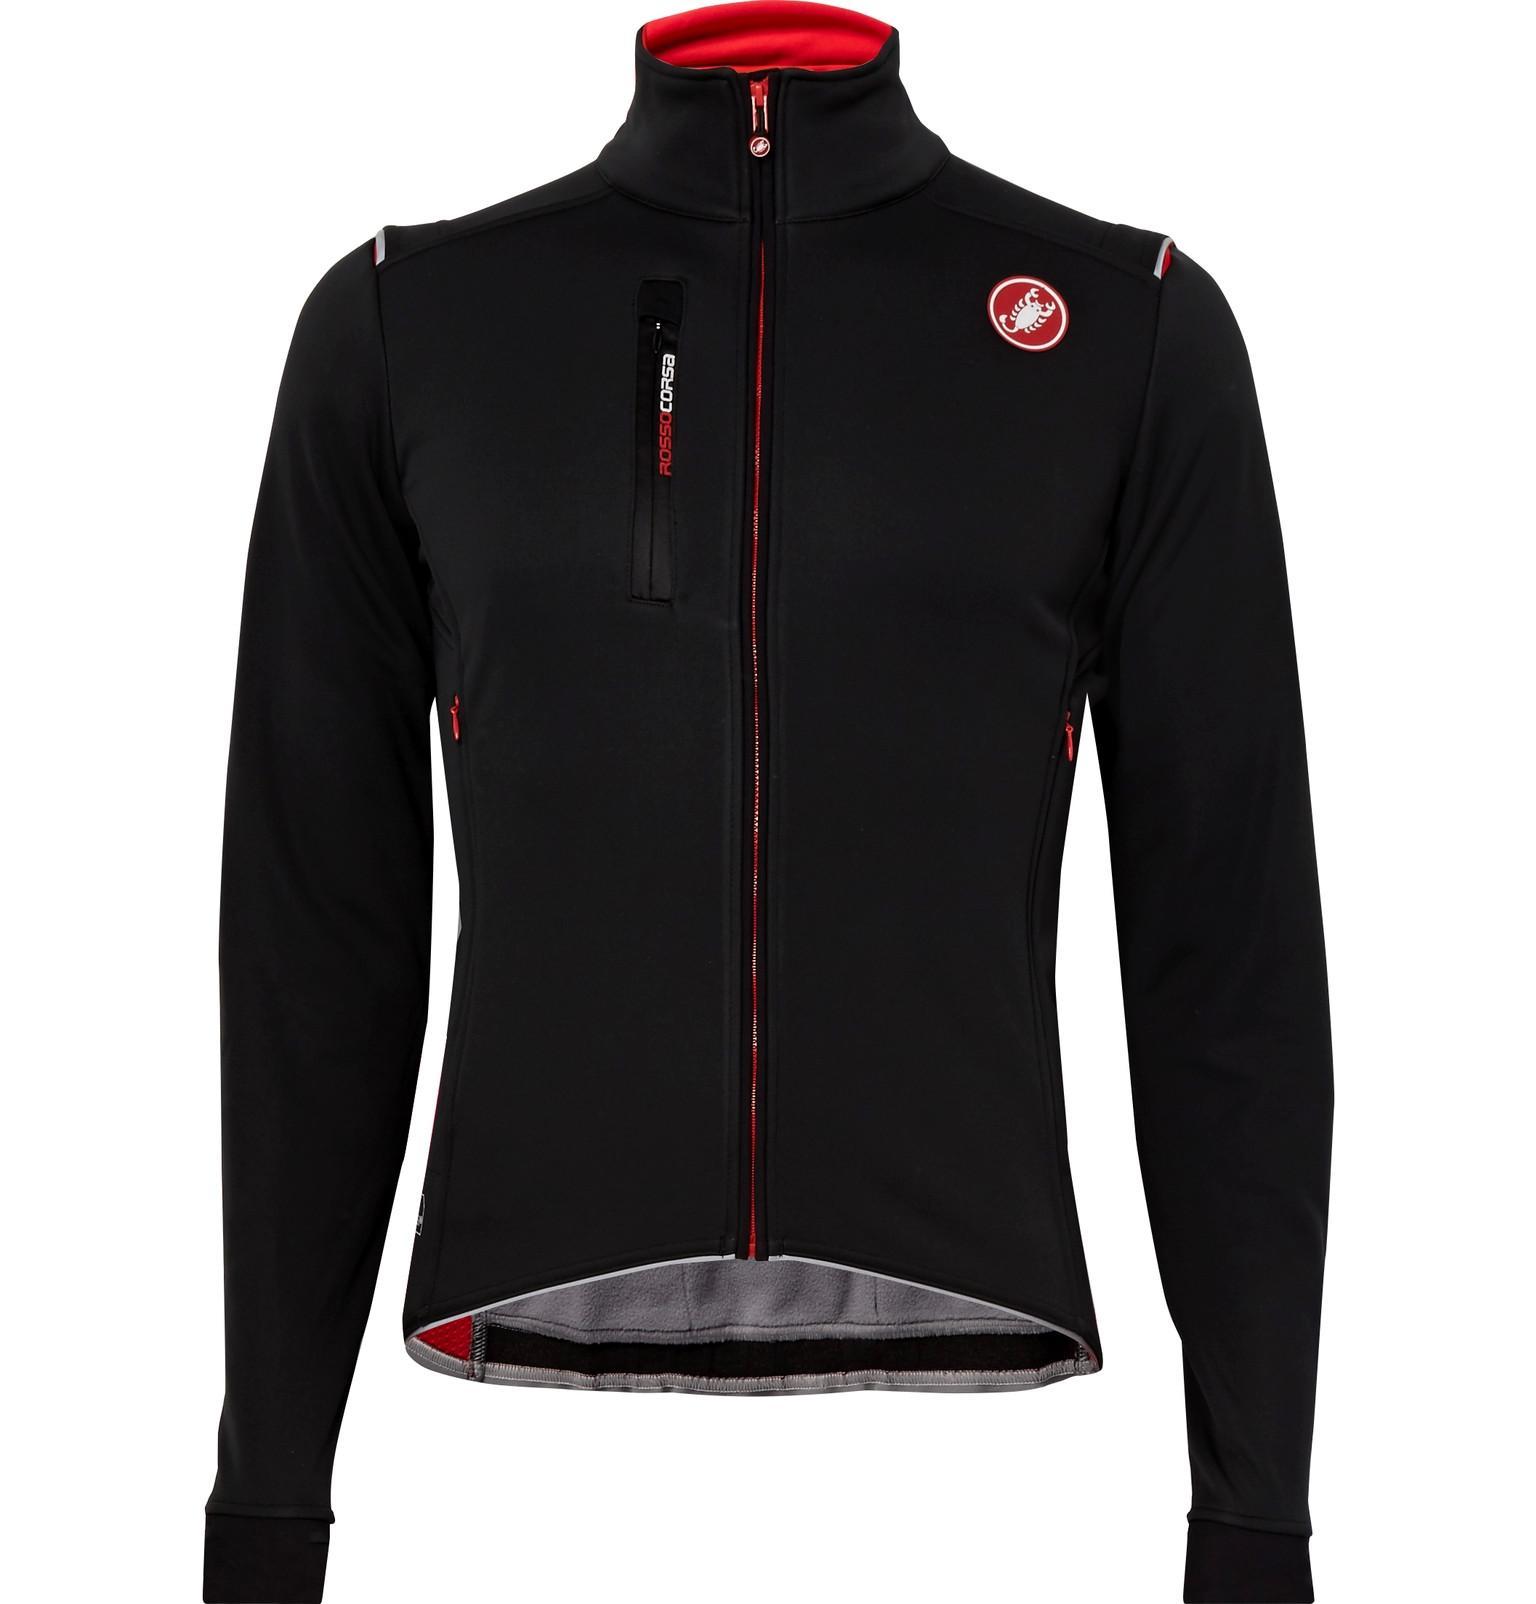 Lyst - Castelli Espresso 4 Gore Windstopper Cycling Jacket in Black ... 8244e4fb7